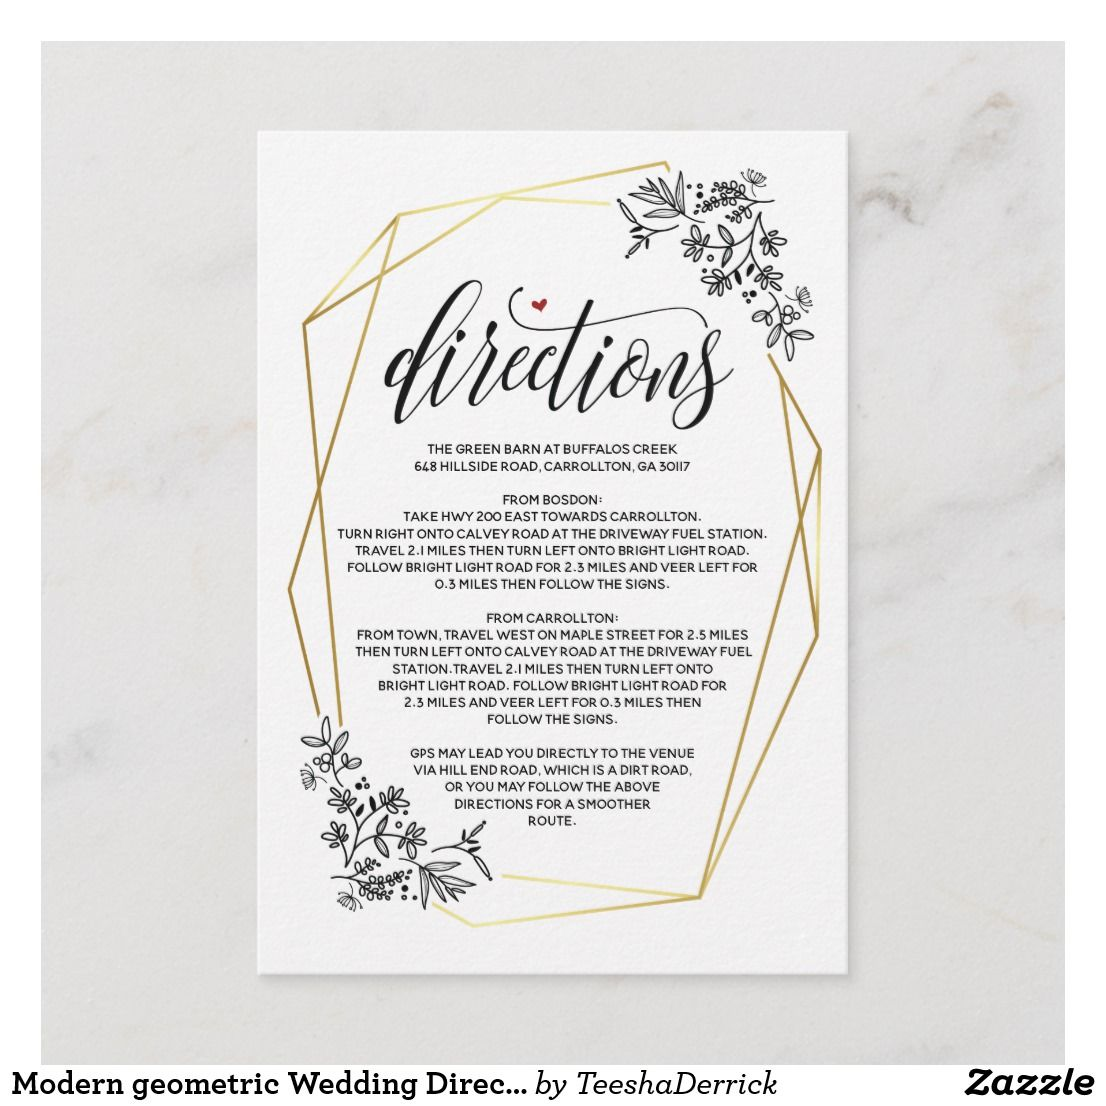 Modern Geometric Wedding Direction Enclosure Card Zazzle Com Wedding Enclosure Cards Wedding Directions Geometric Wedding